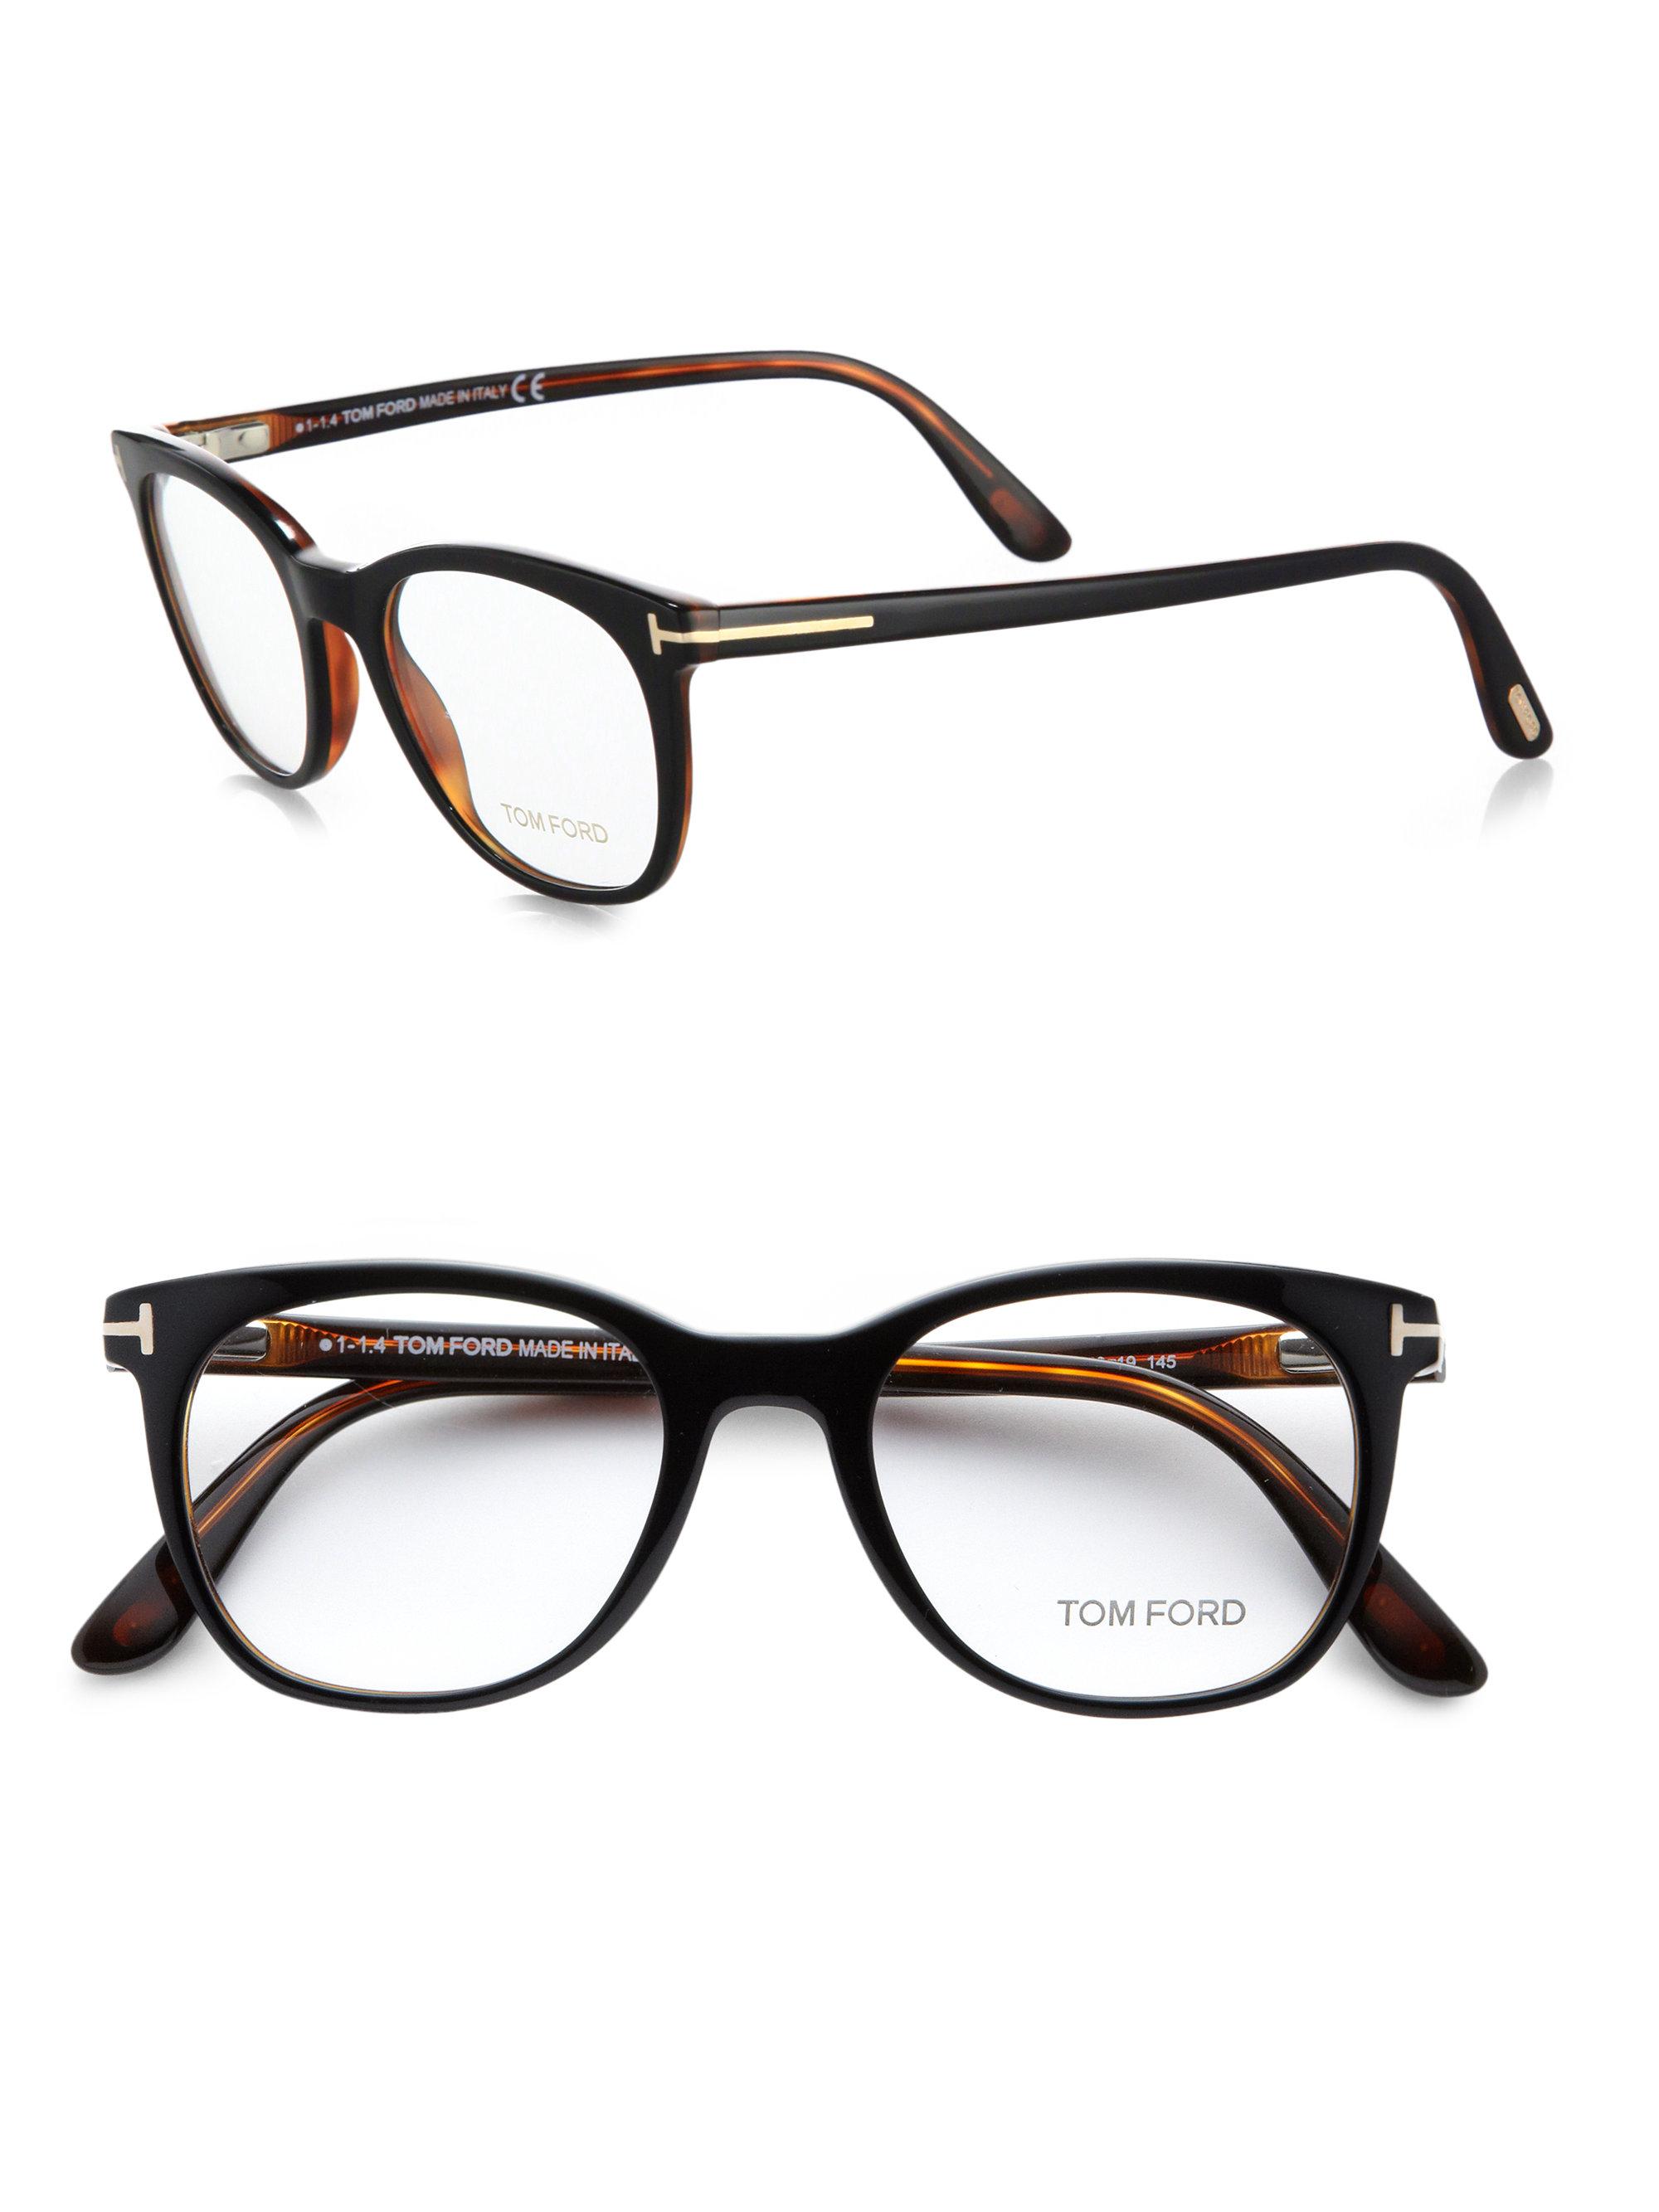 Tom Ford 5310 Rounded Optical Frames In Black For Men Lyst